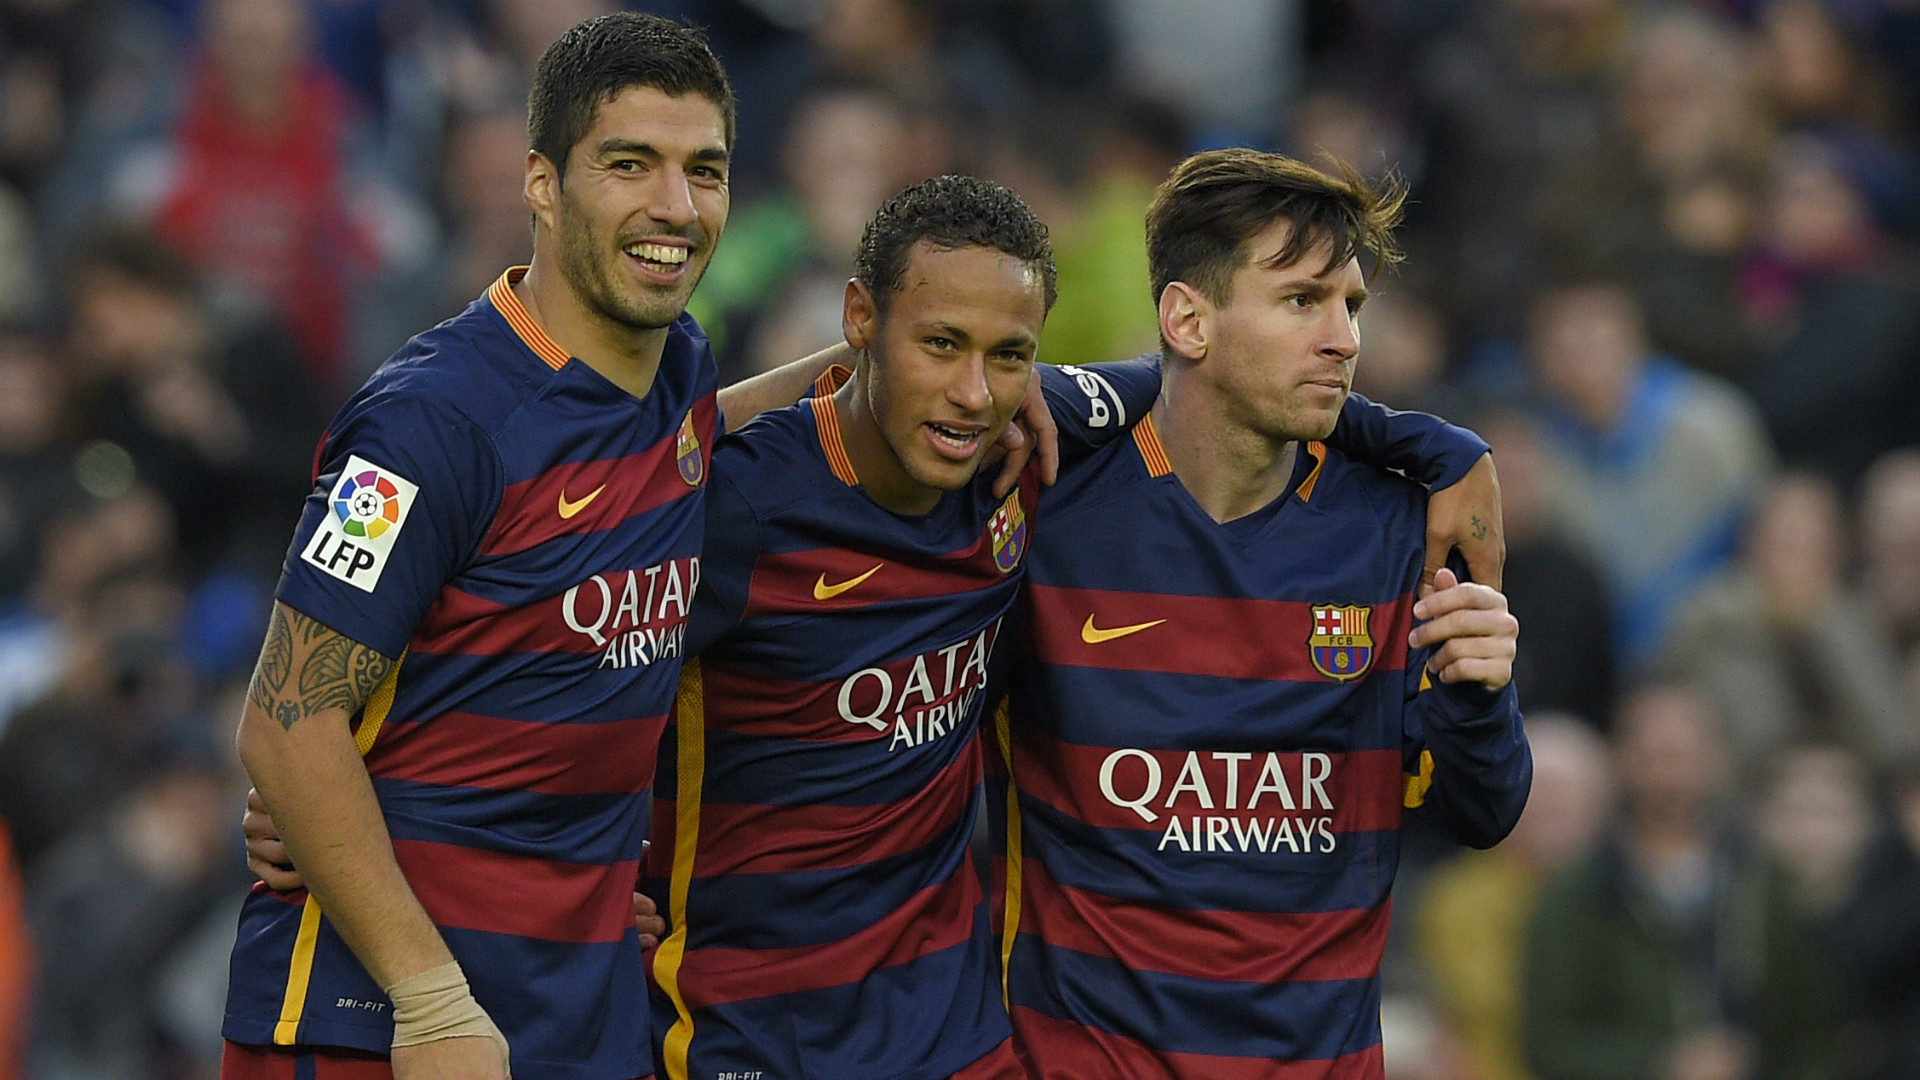 … Neymar: 'MSN' should be Ballon d'Or …